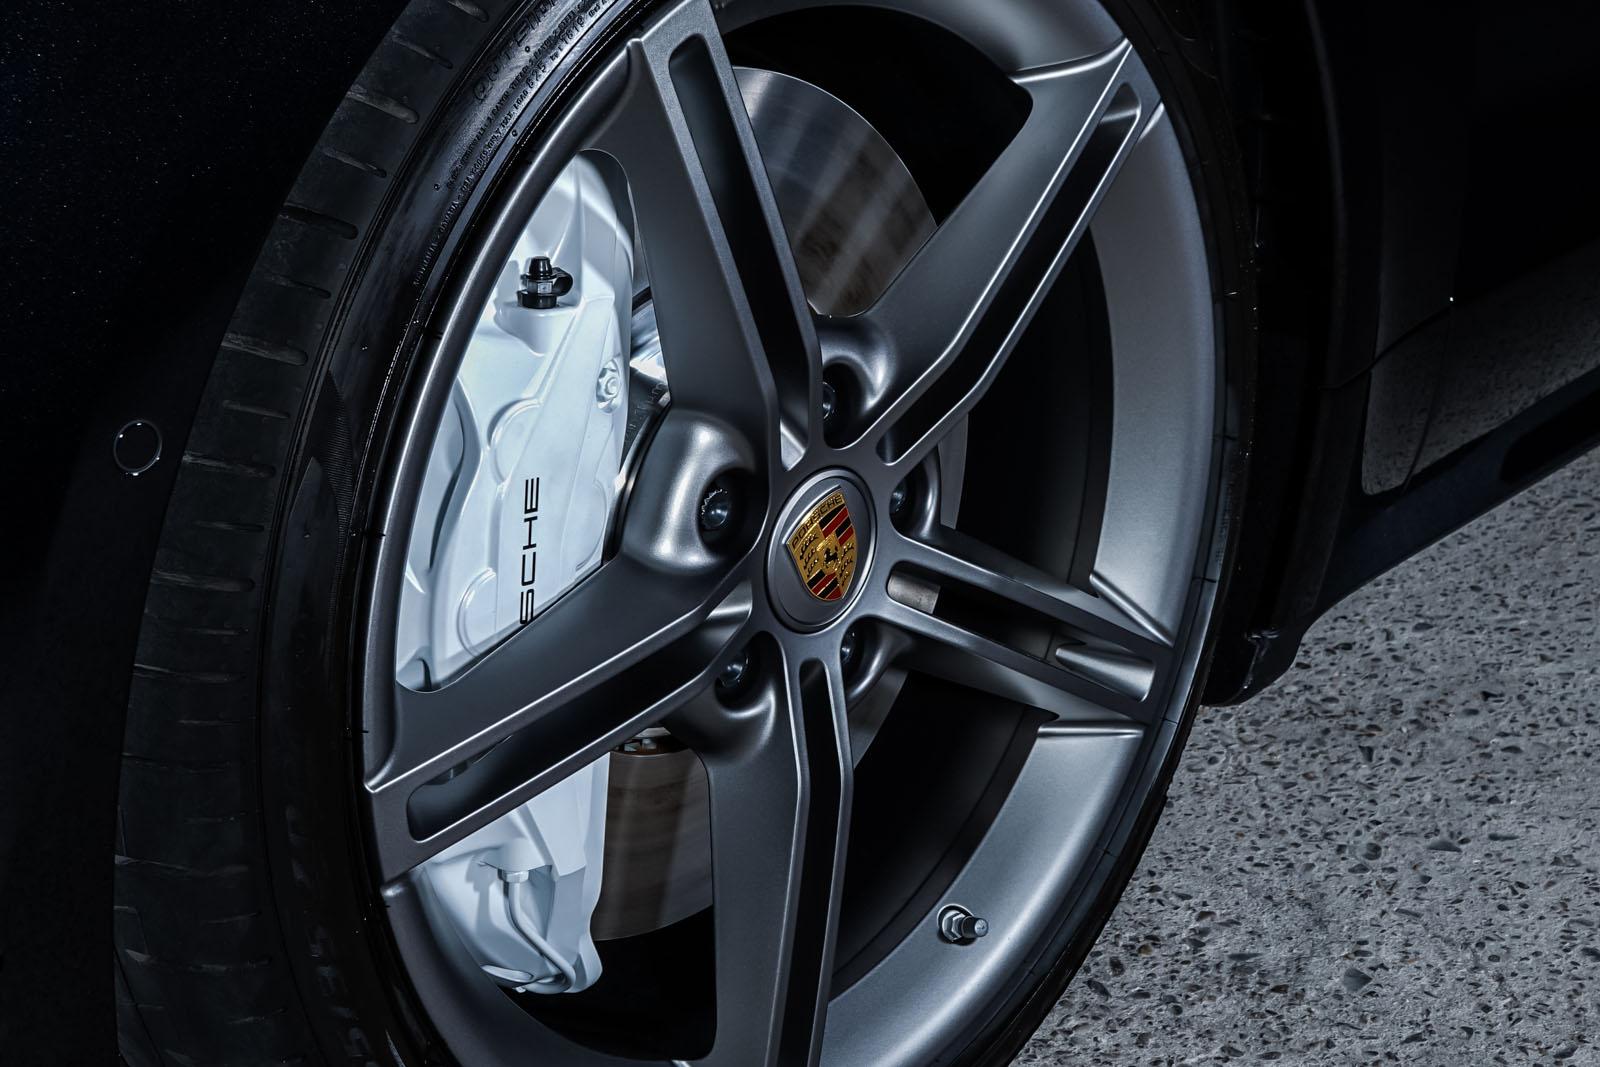 Porsche_Taycan_Turbo_Schwarz_Schwarz_POR-8106_12_w